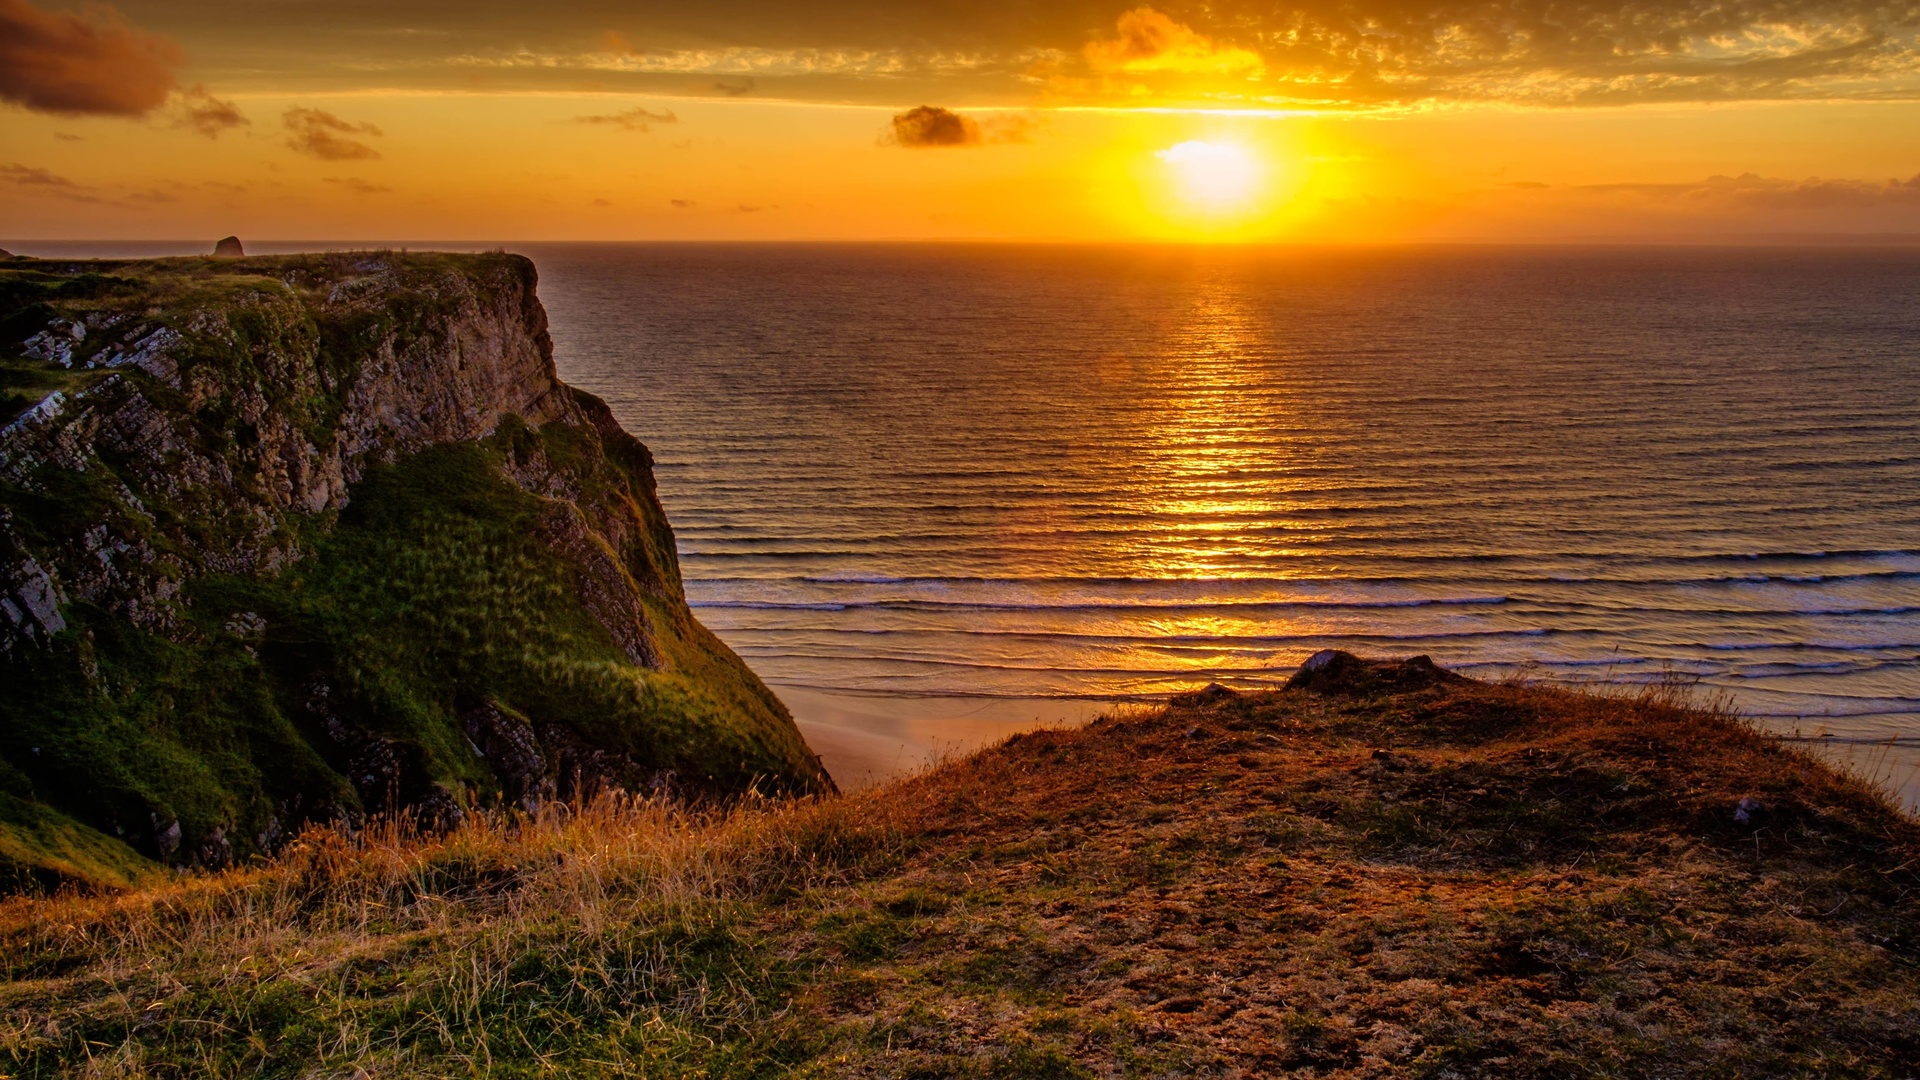 закат, горизонт, скалы, водная гладь, трава